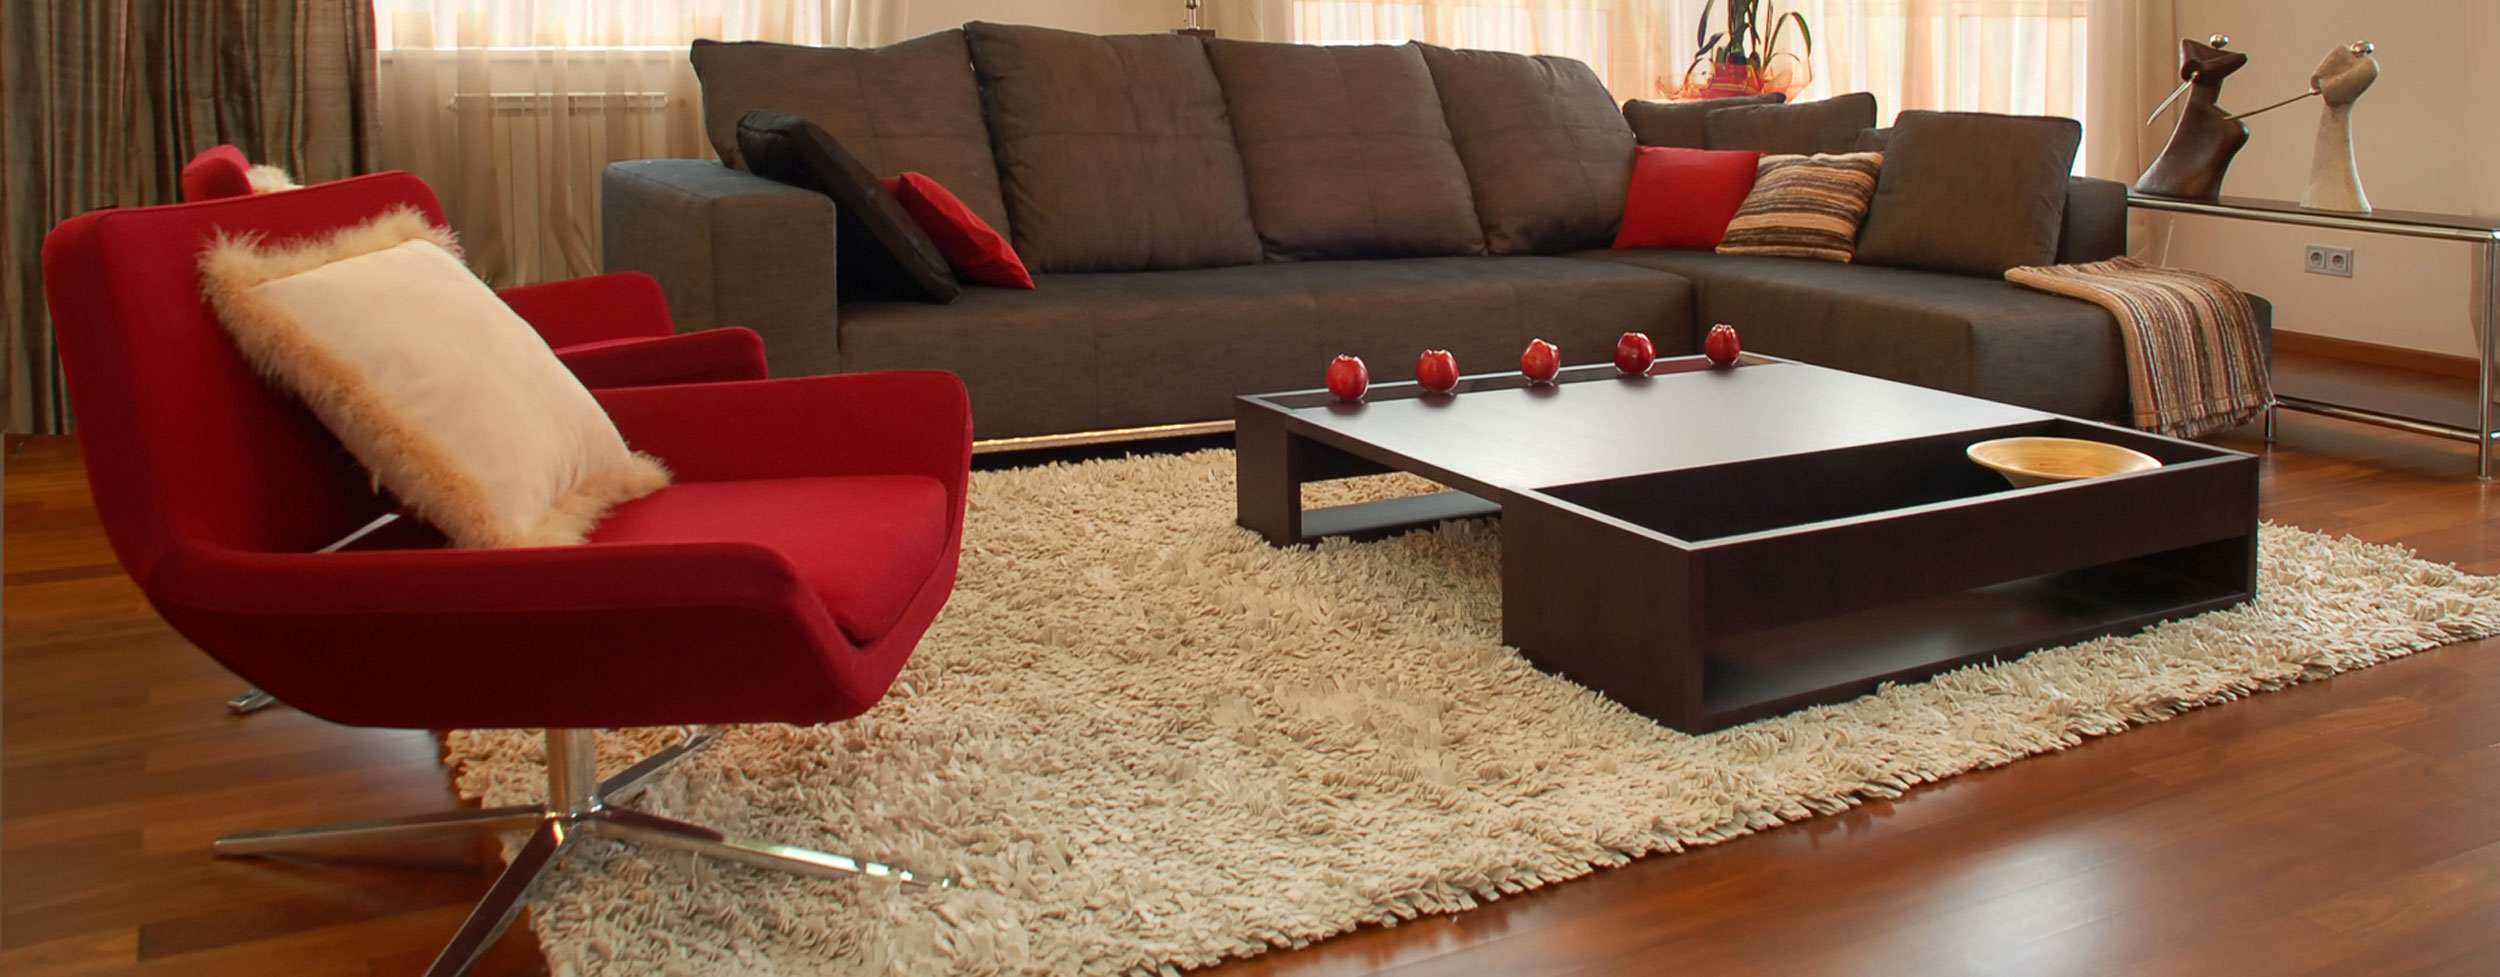 Olx cali muebles